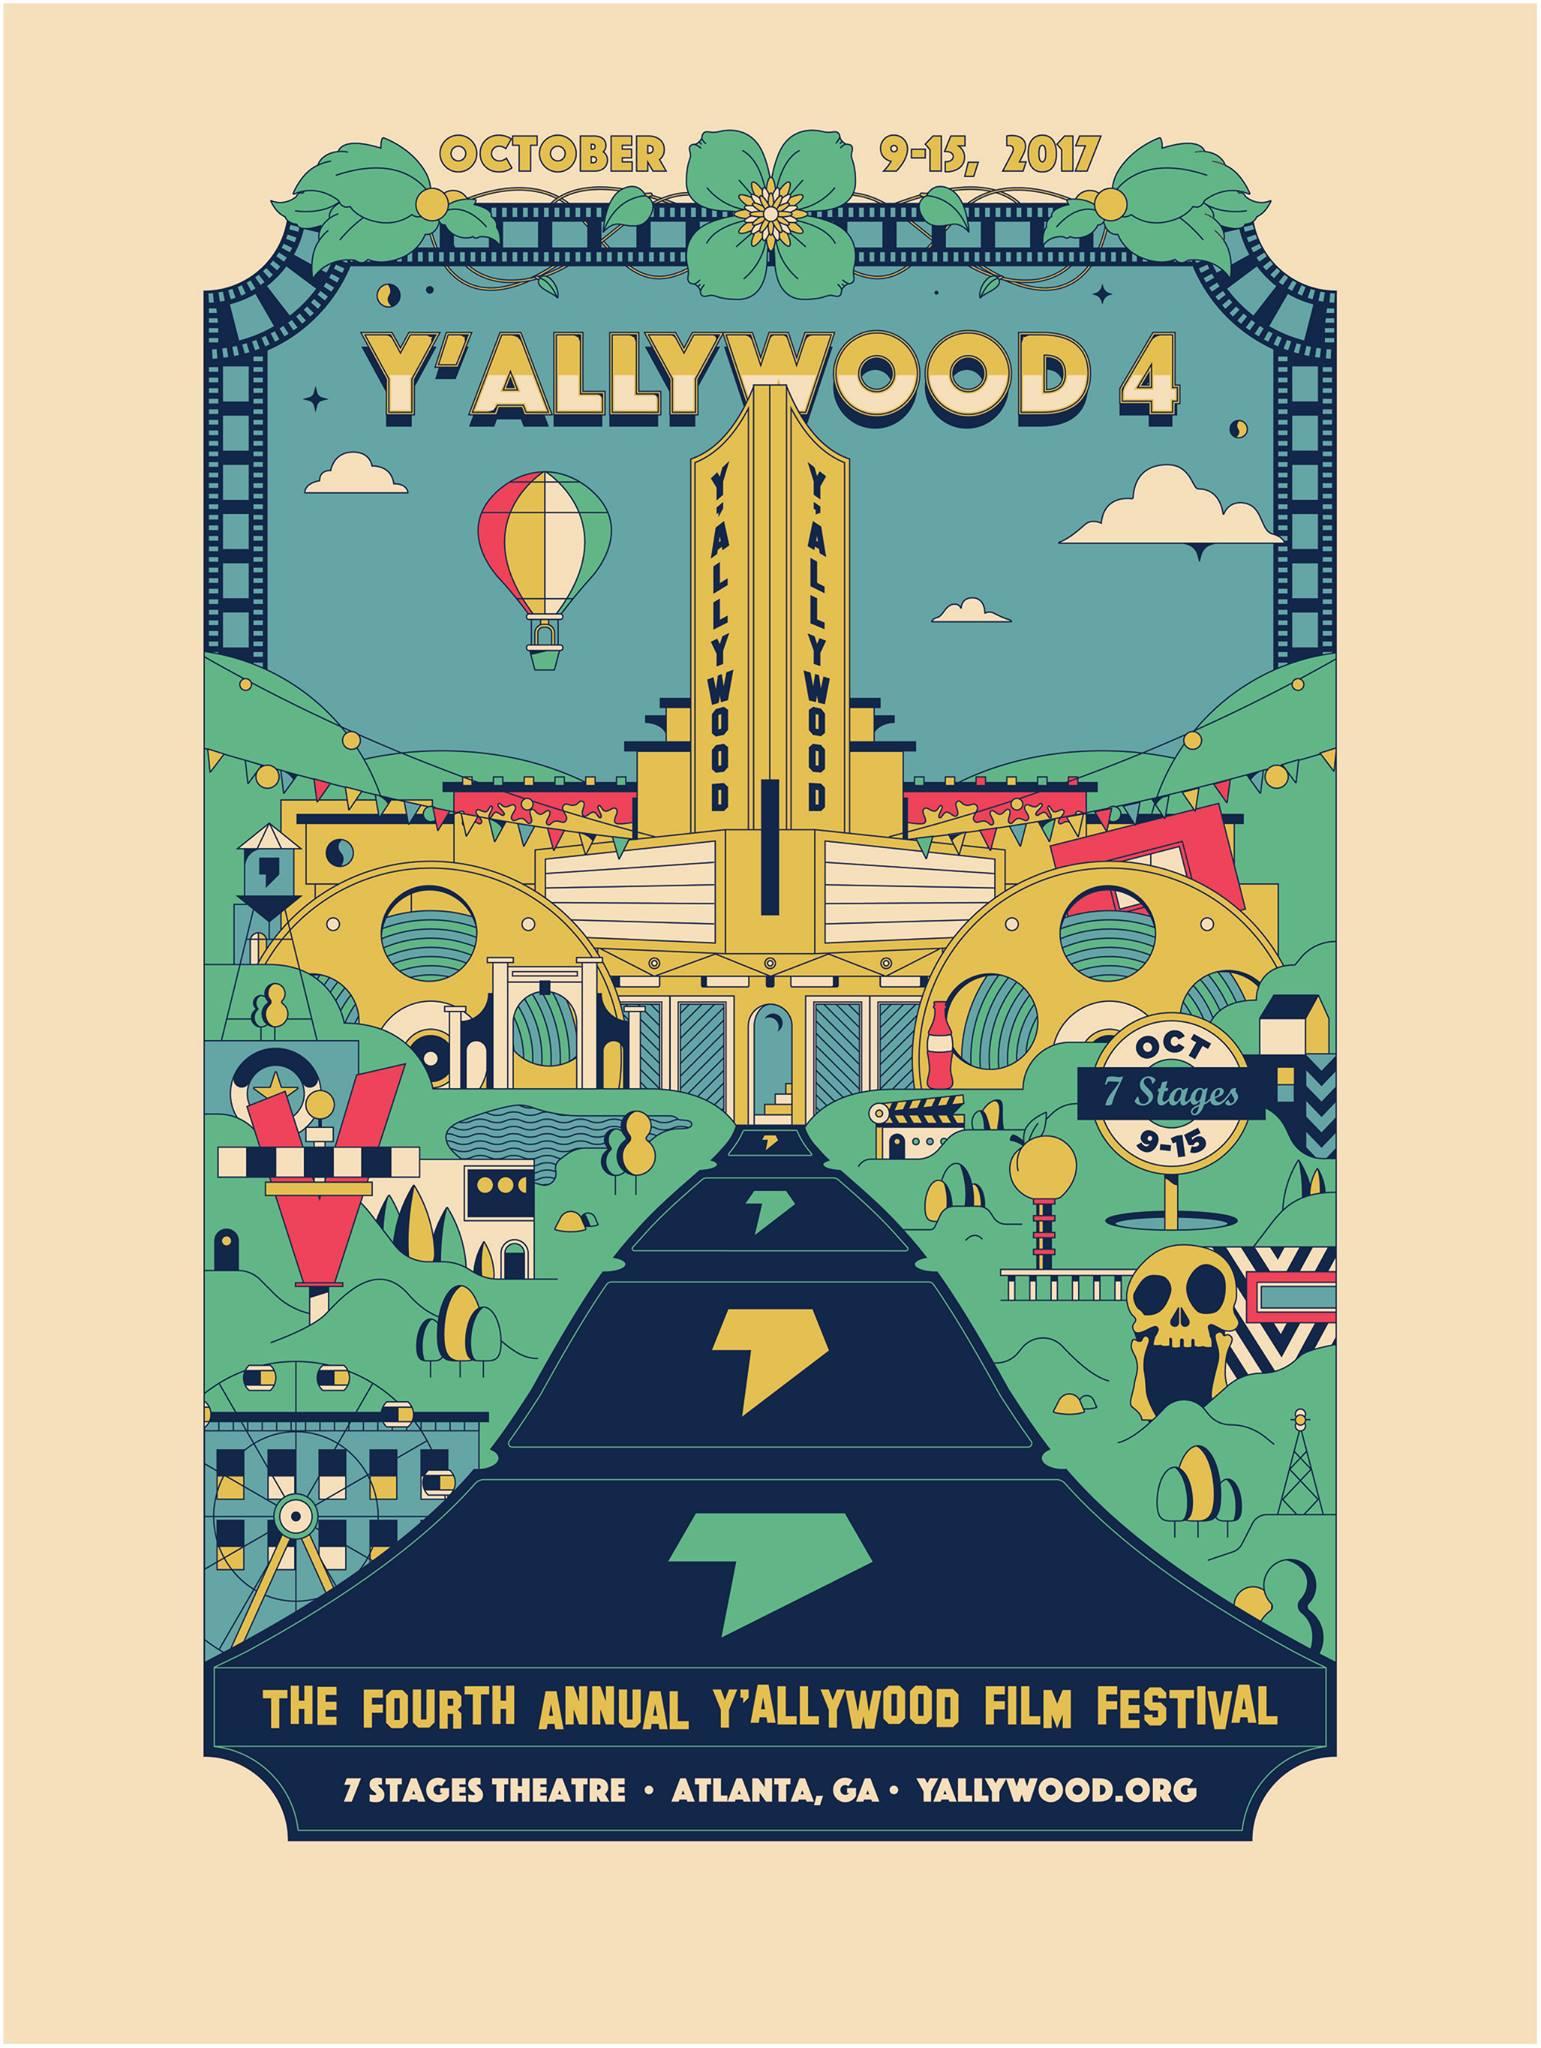 Y'allywood local film festival returns for its 4th year all week.